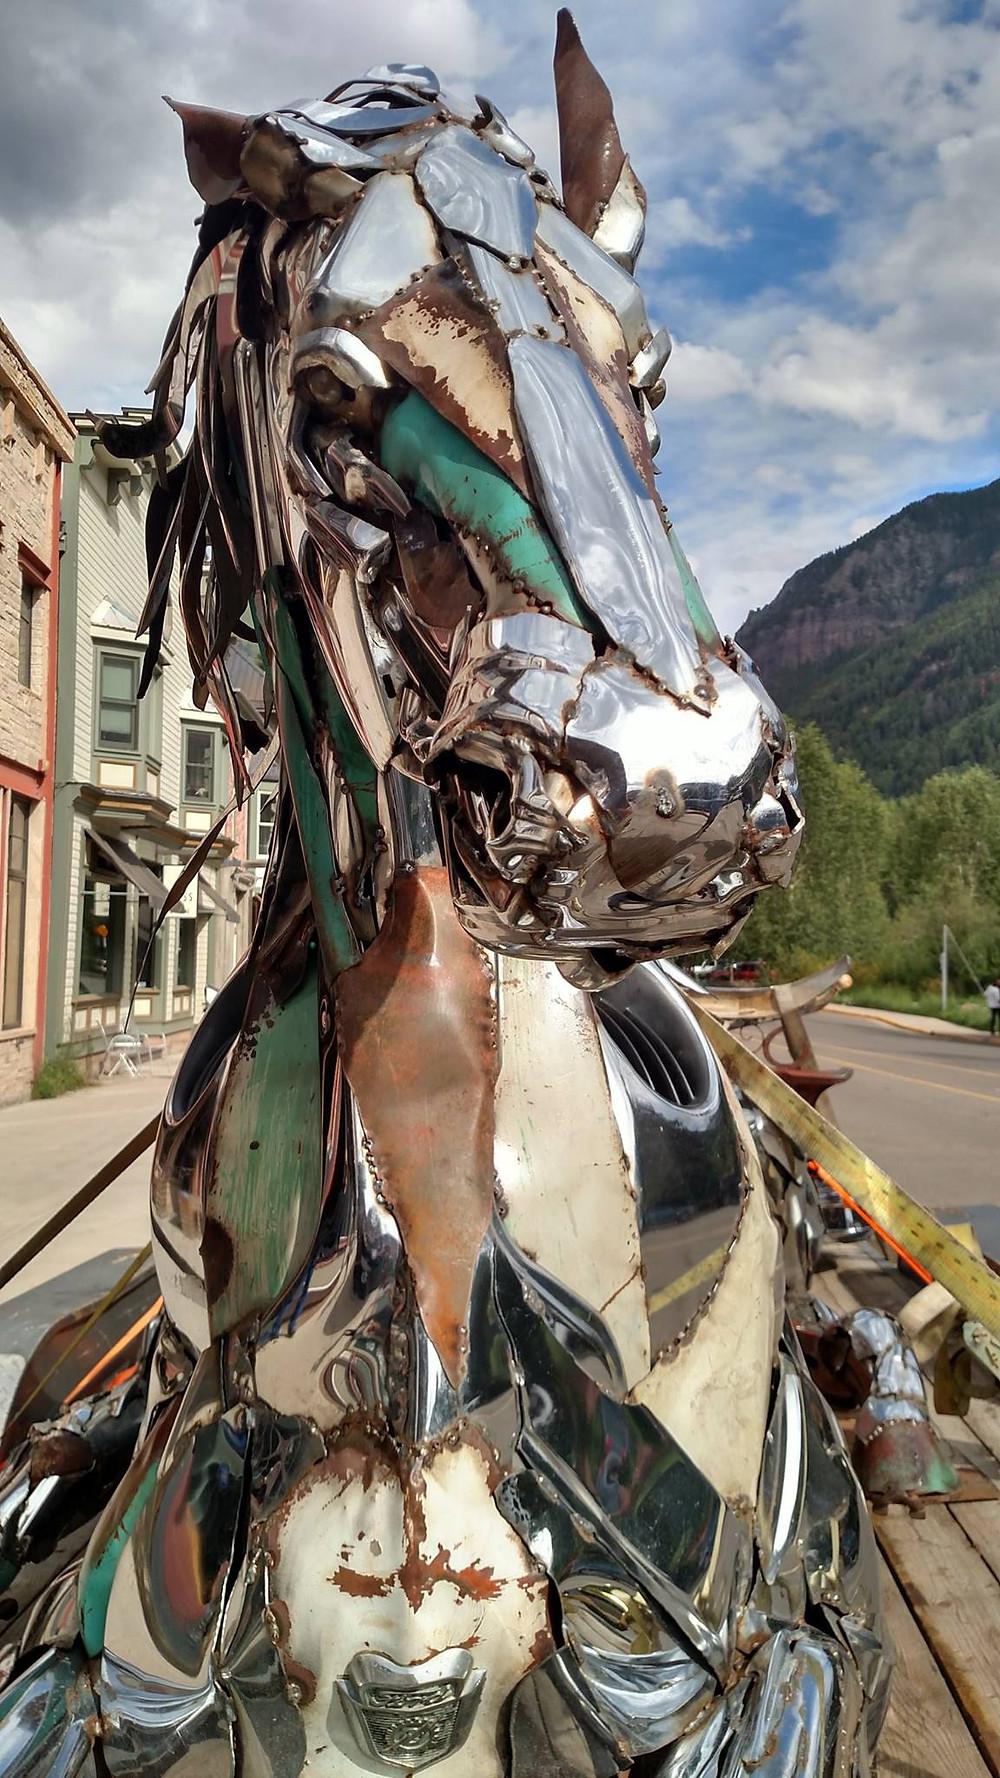 Chrome Horse Sculpture in Telluride